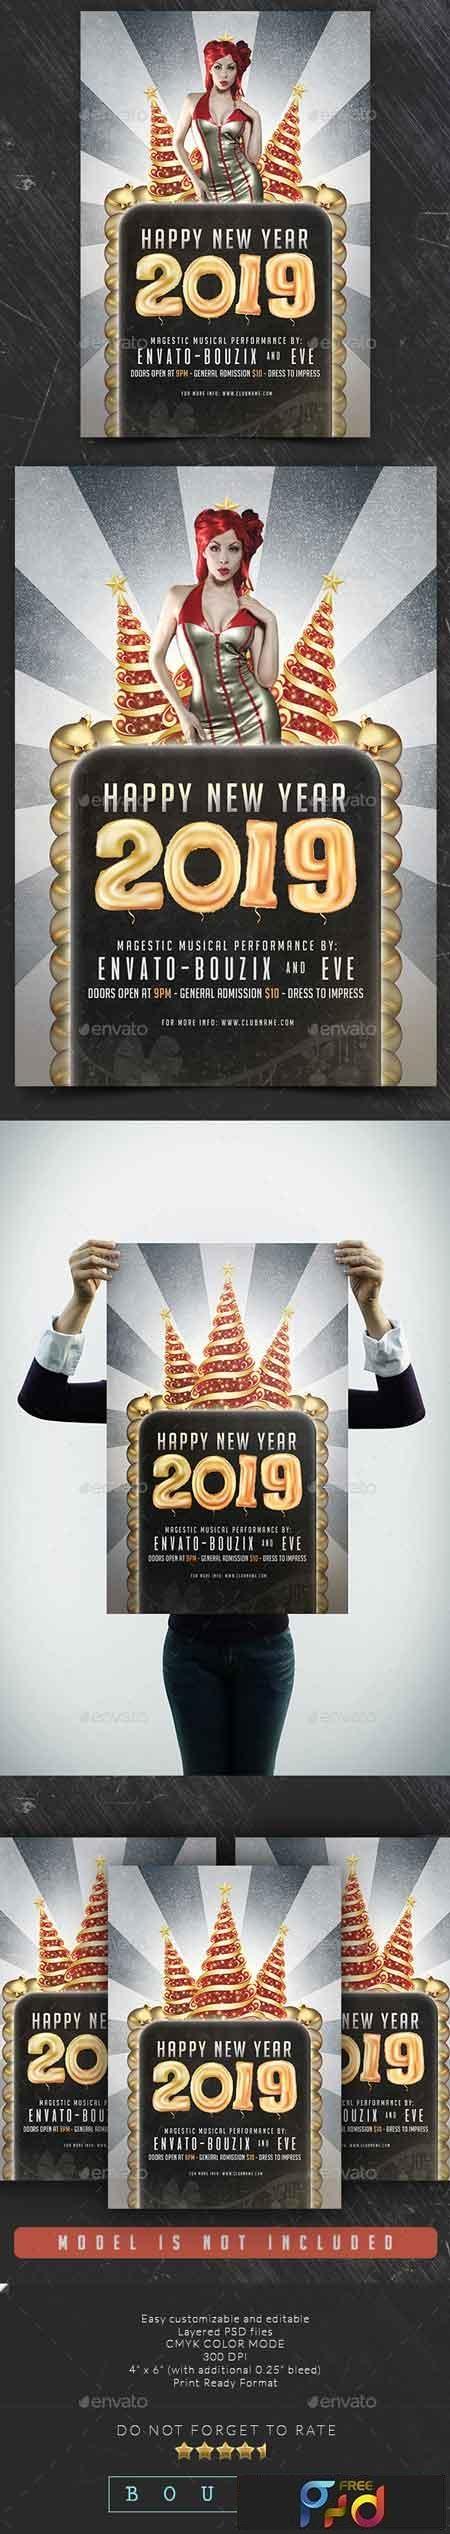 Happy New Year 2019 Flyer 22734077 1